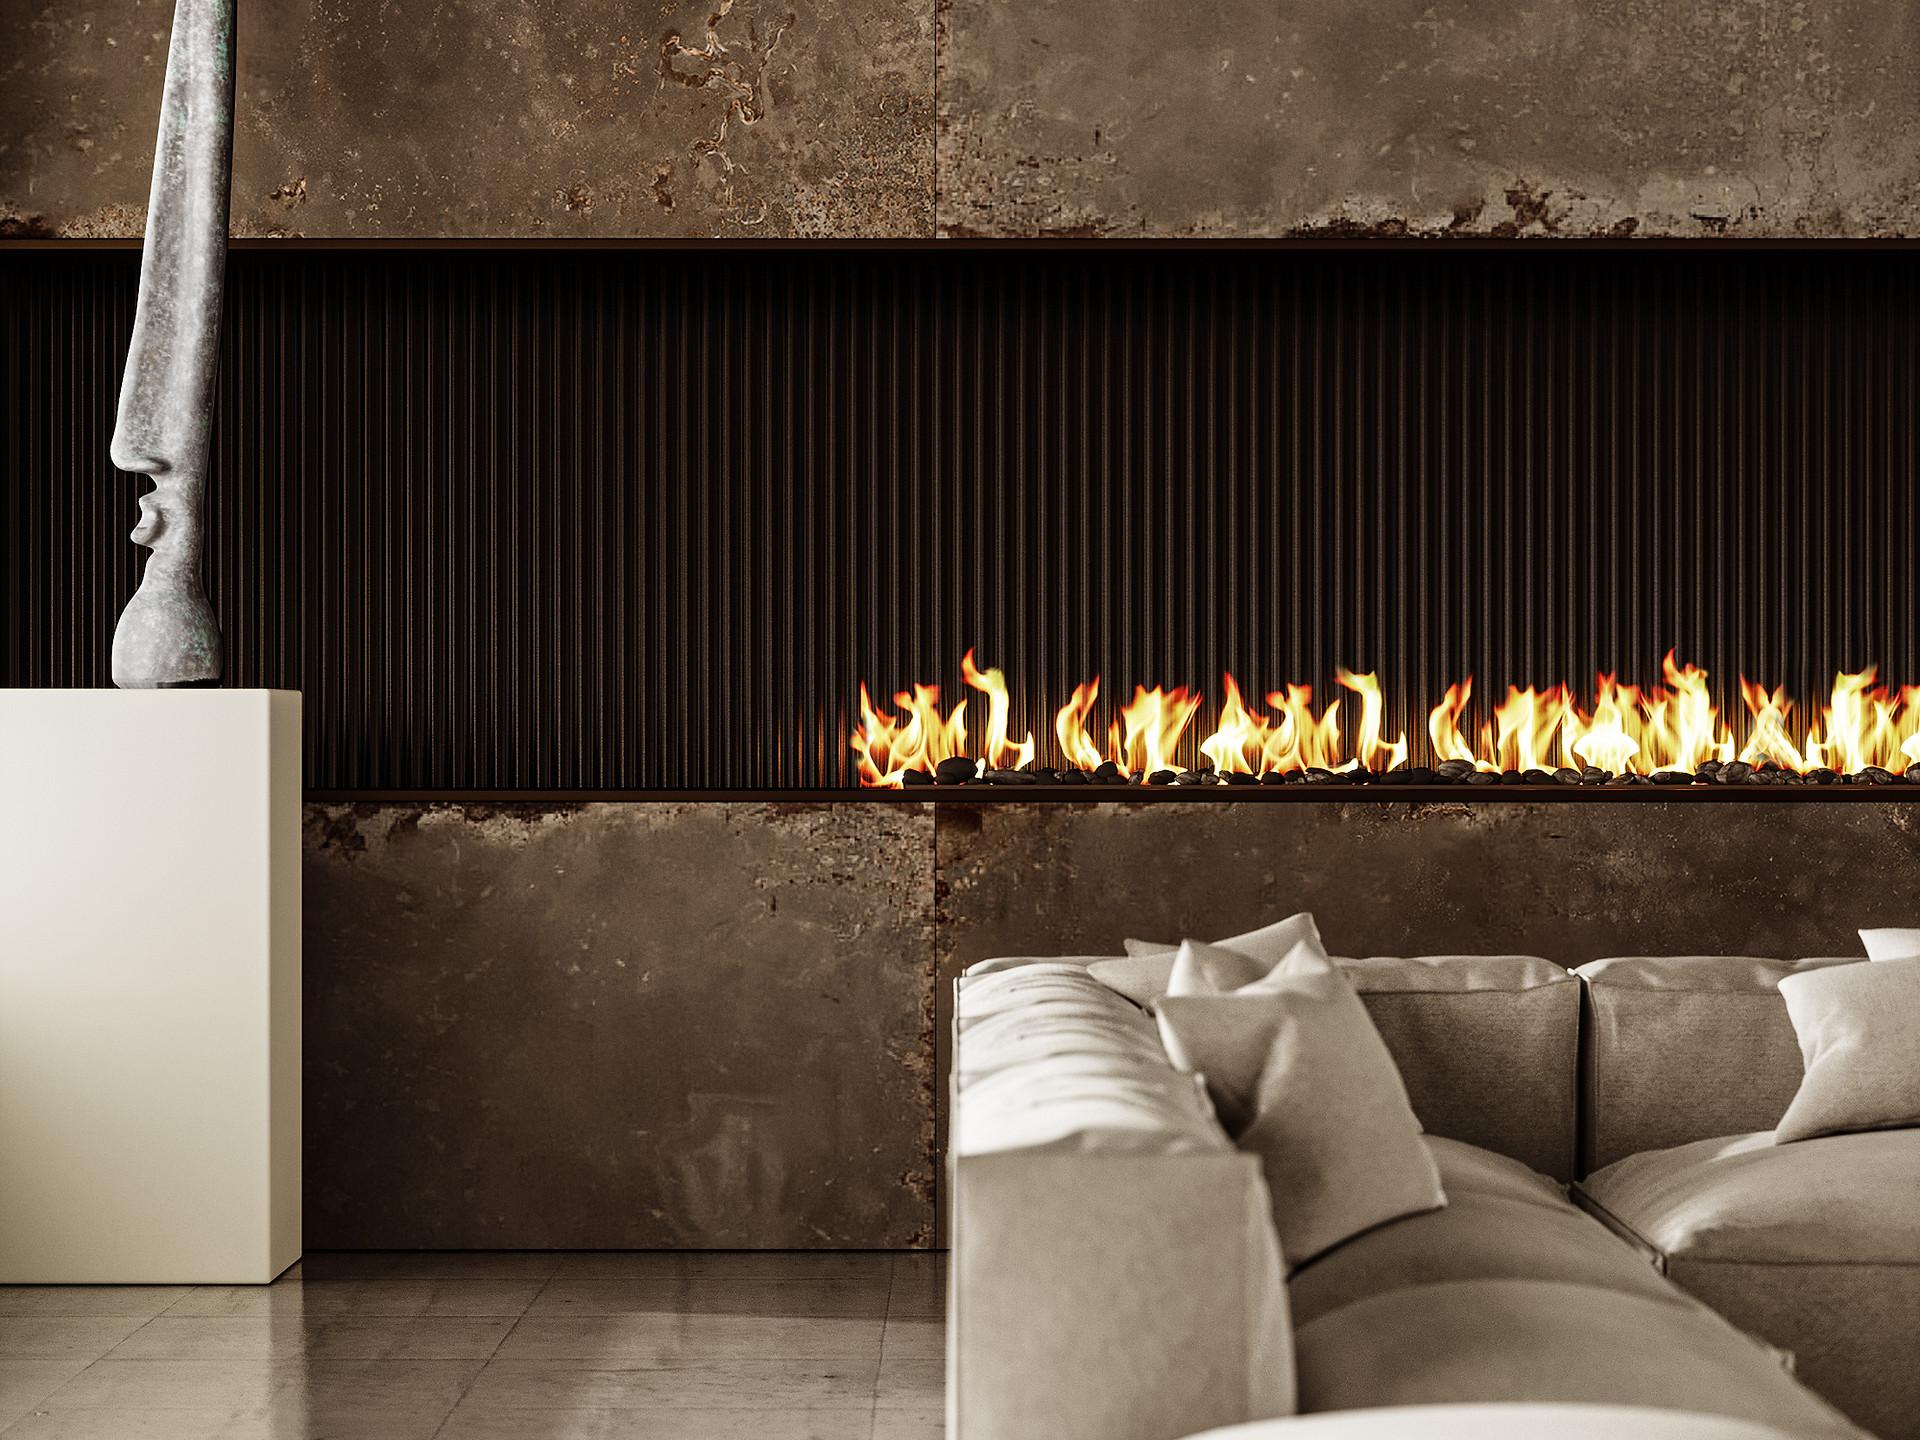 Malaga_Penthouse_Miminat Designs 2.jpg